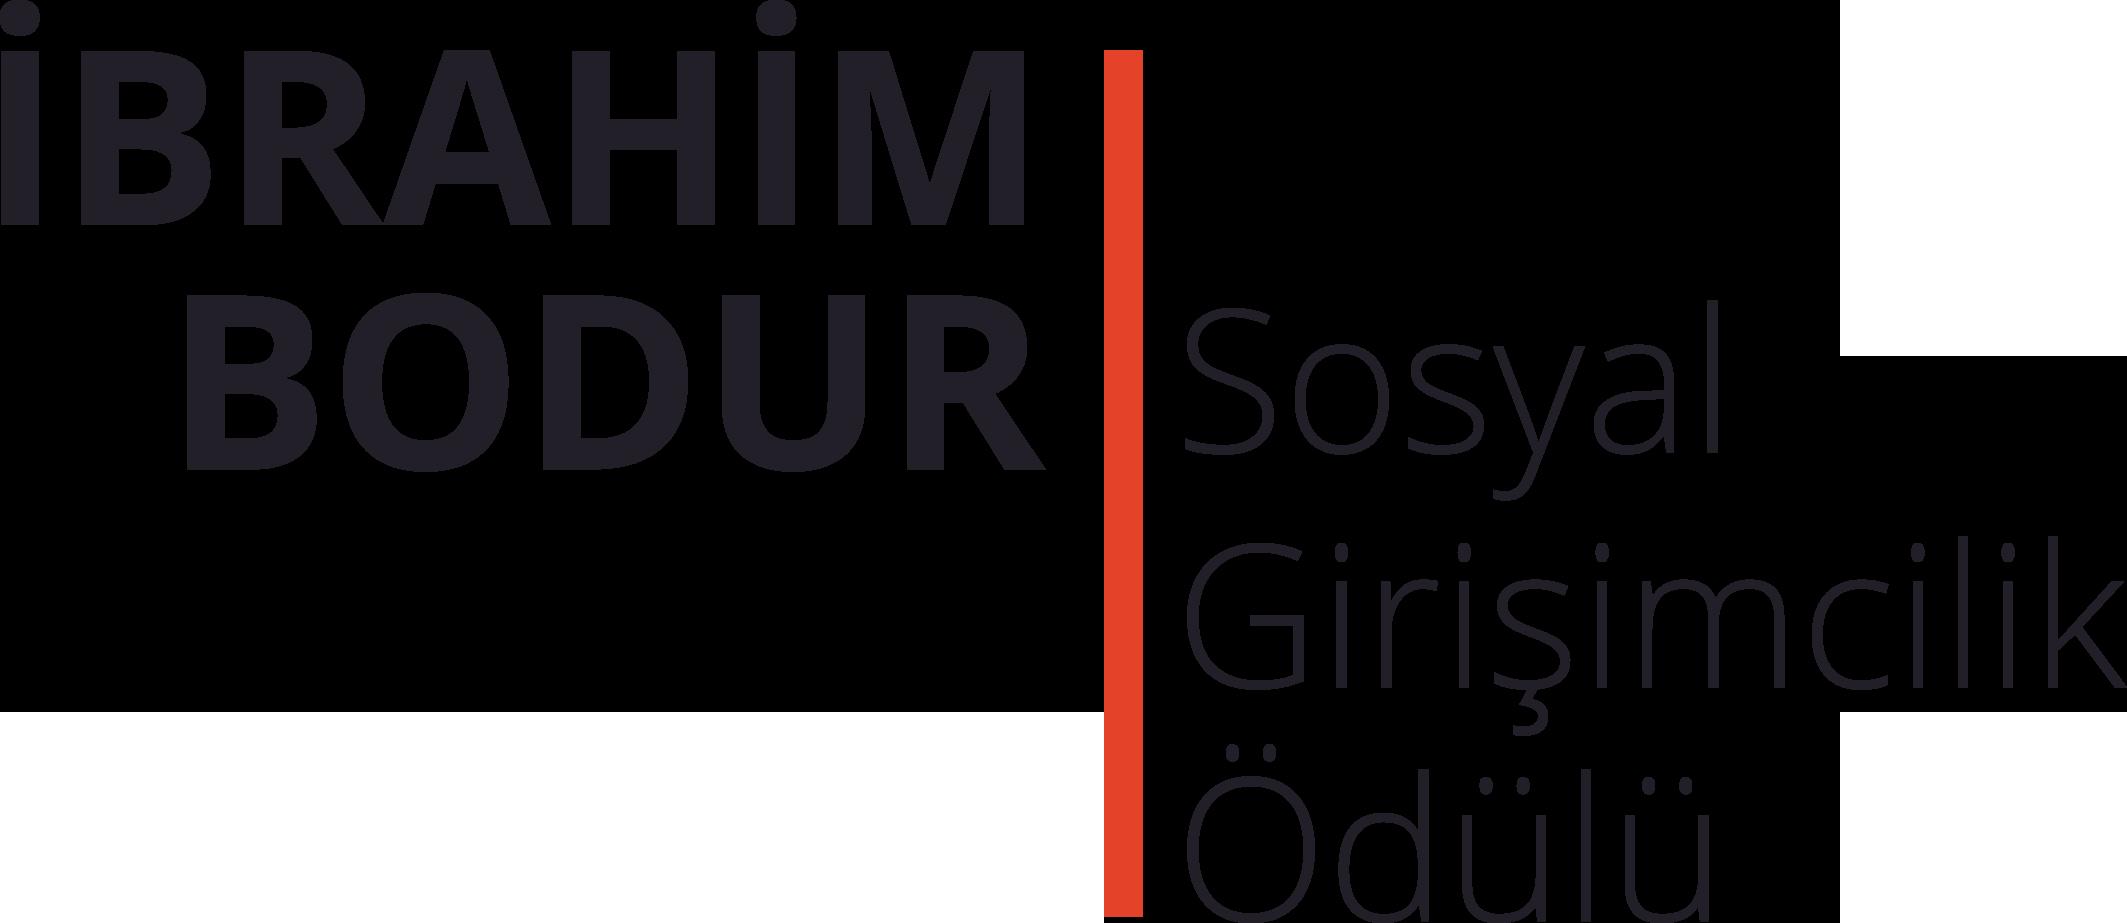 Ibrahim Bodur Social Entrepreneurship Award